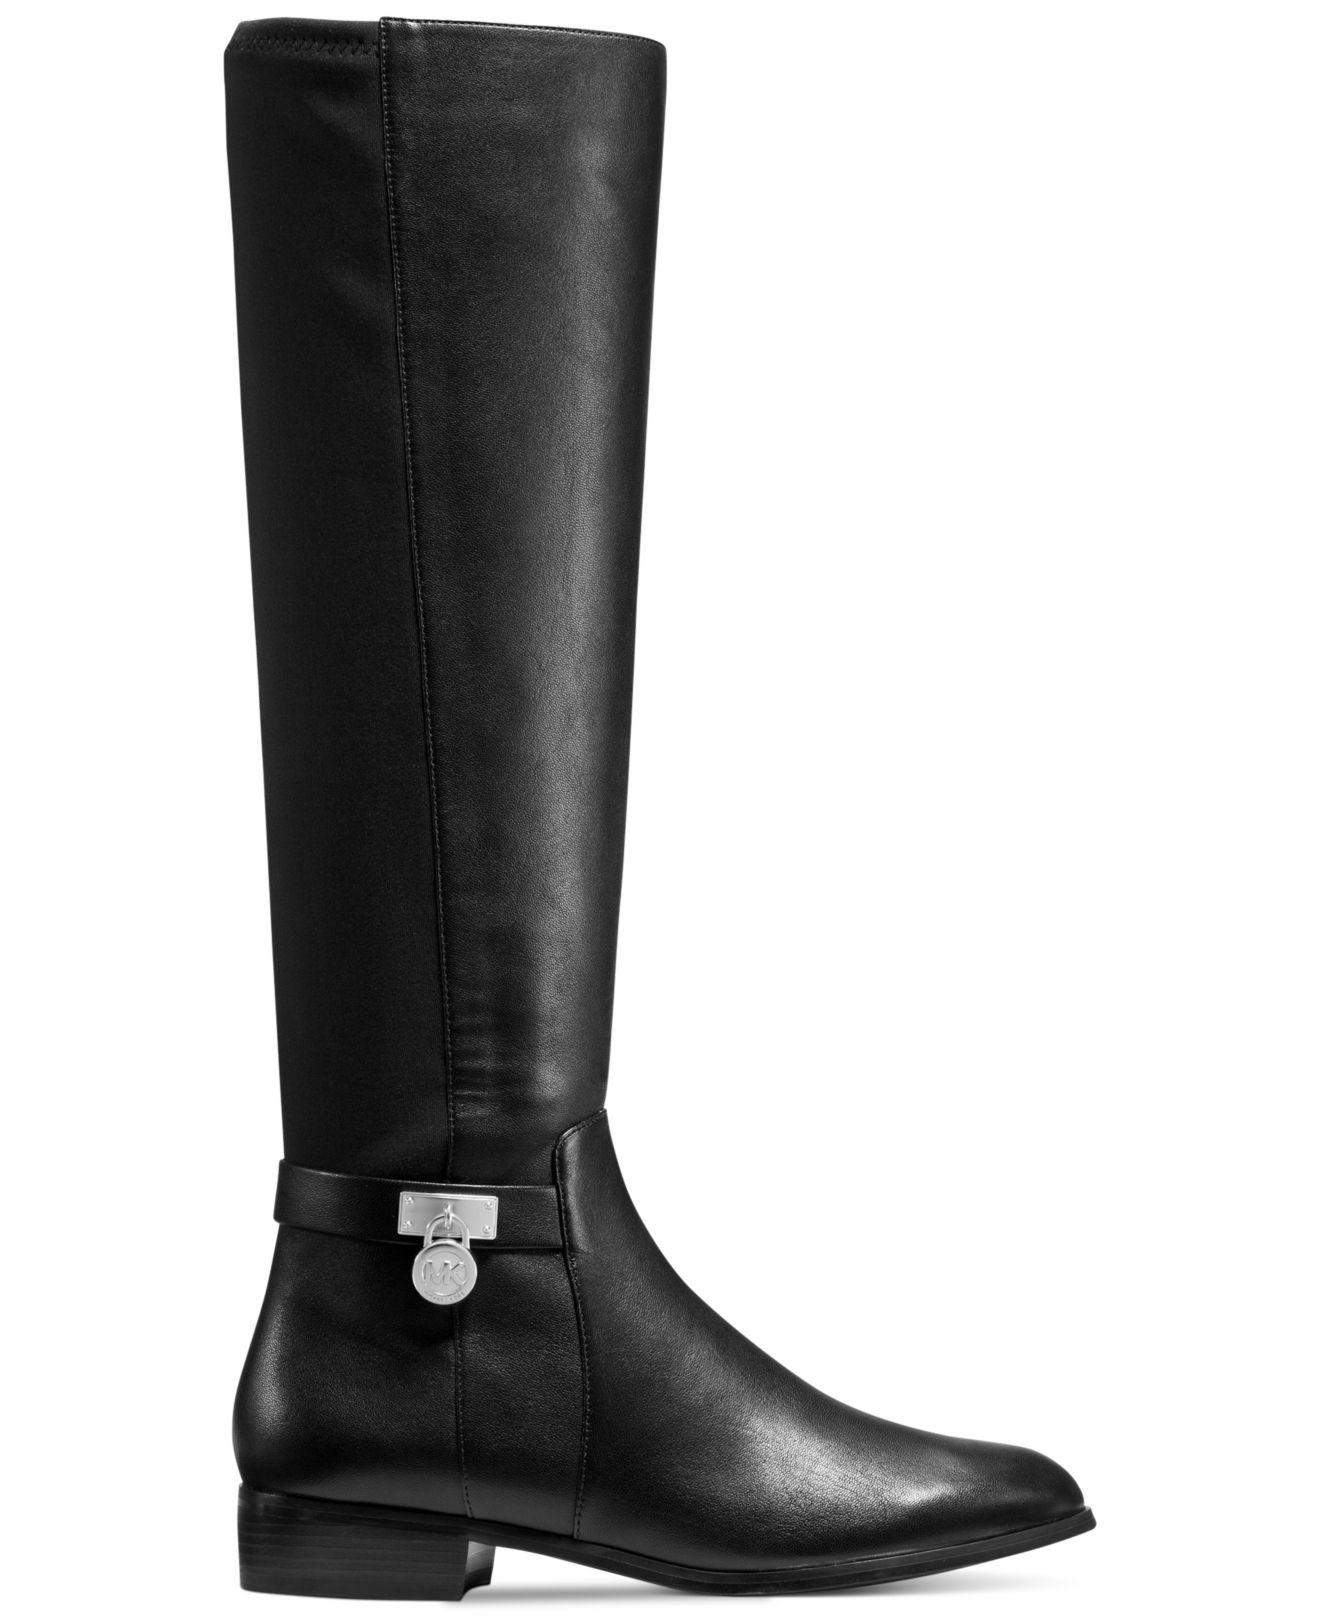 michael kors hamilton 50 50 boots in black lyst. Black Bedroom Furniture Sets. Home Design Ideas